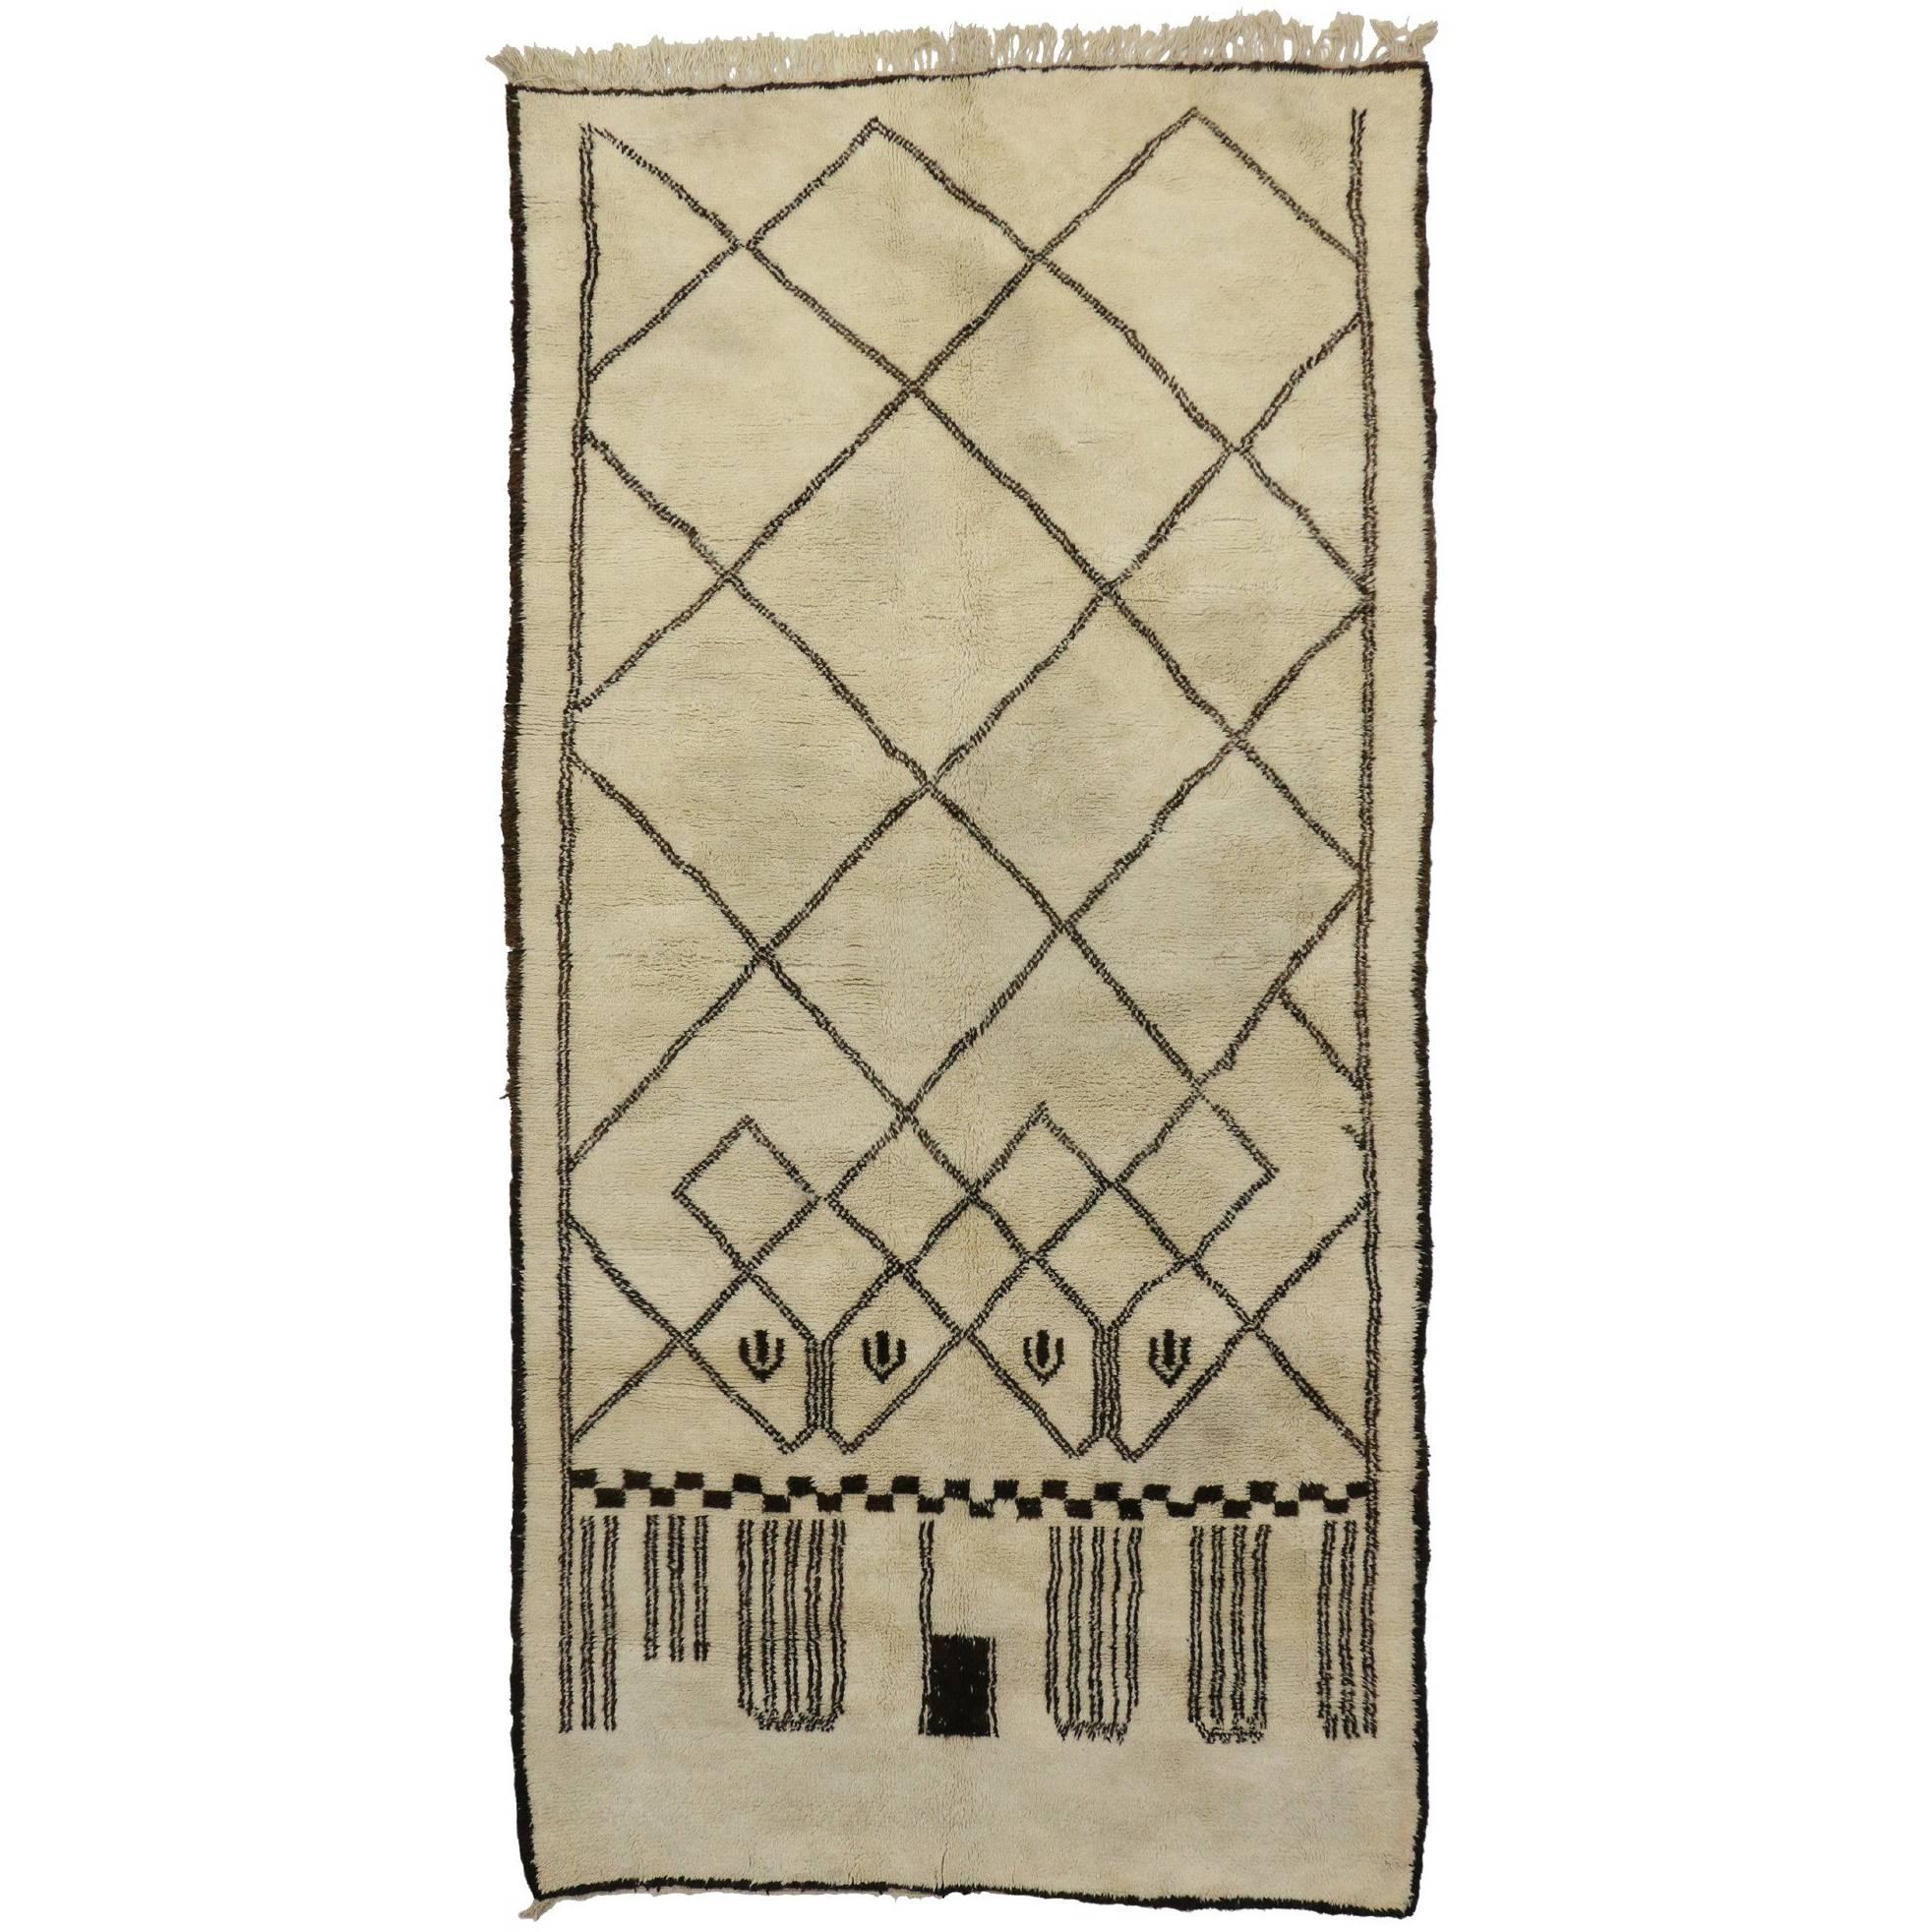 Vintage Berber Moroccan Rug with Modern Bauhaus Style